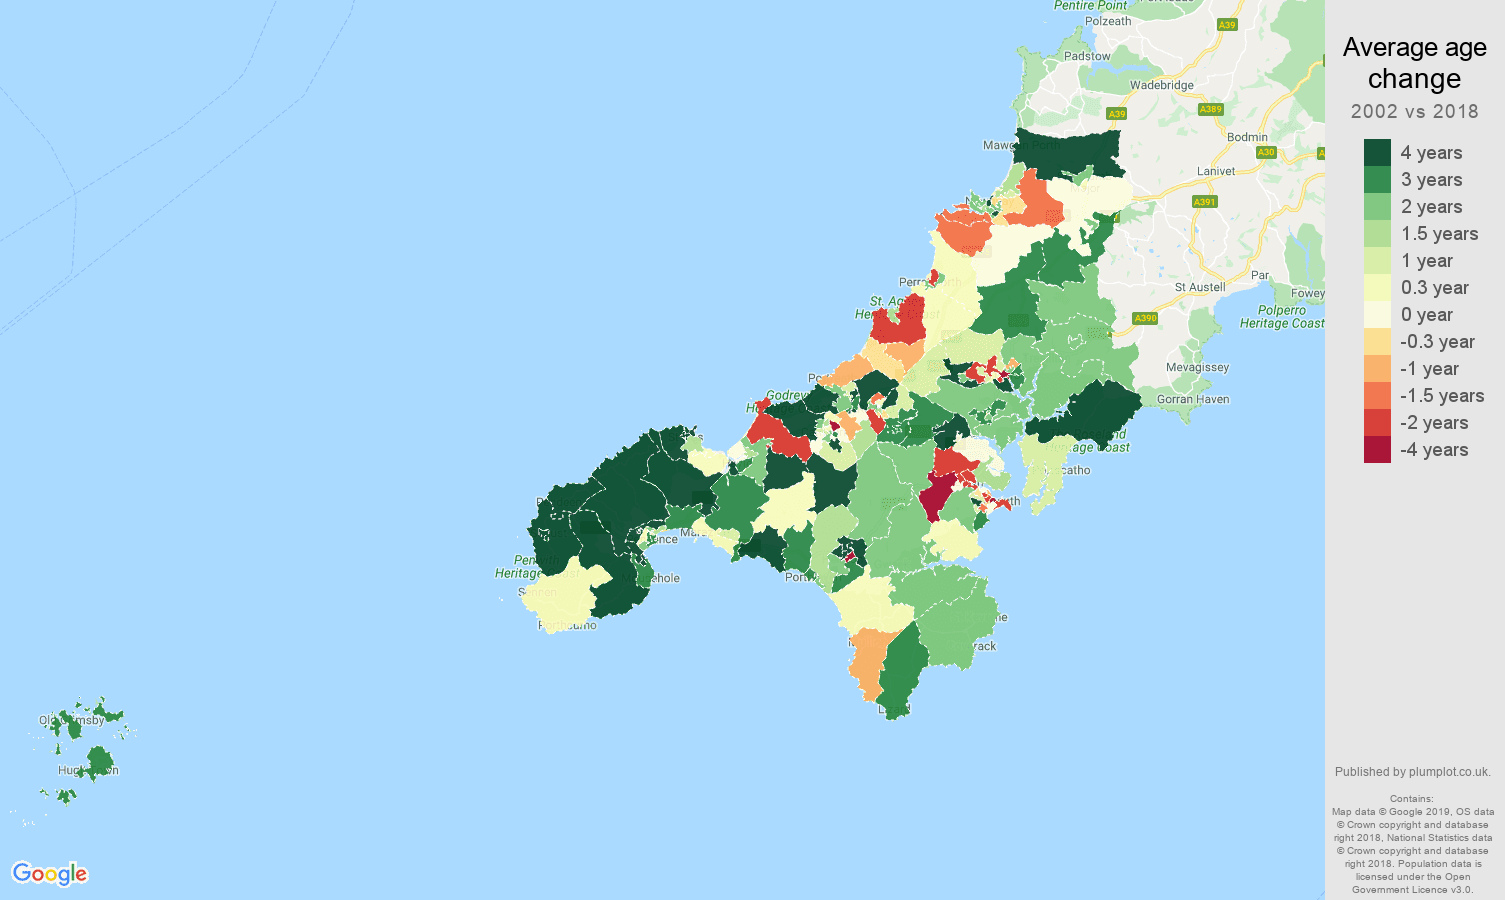 Truro average age change map